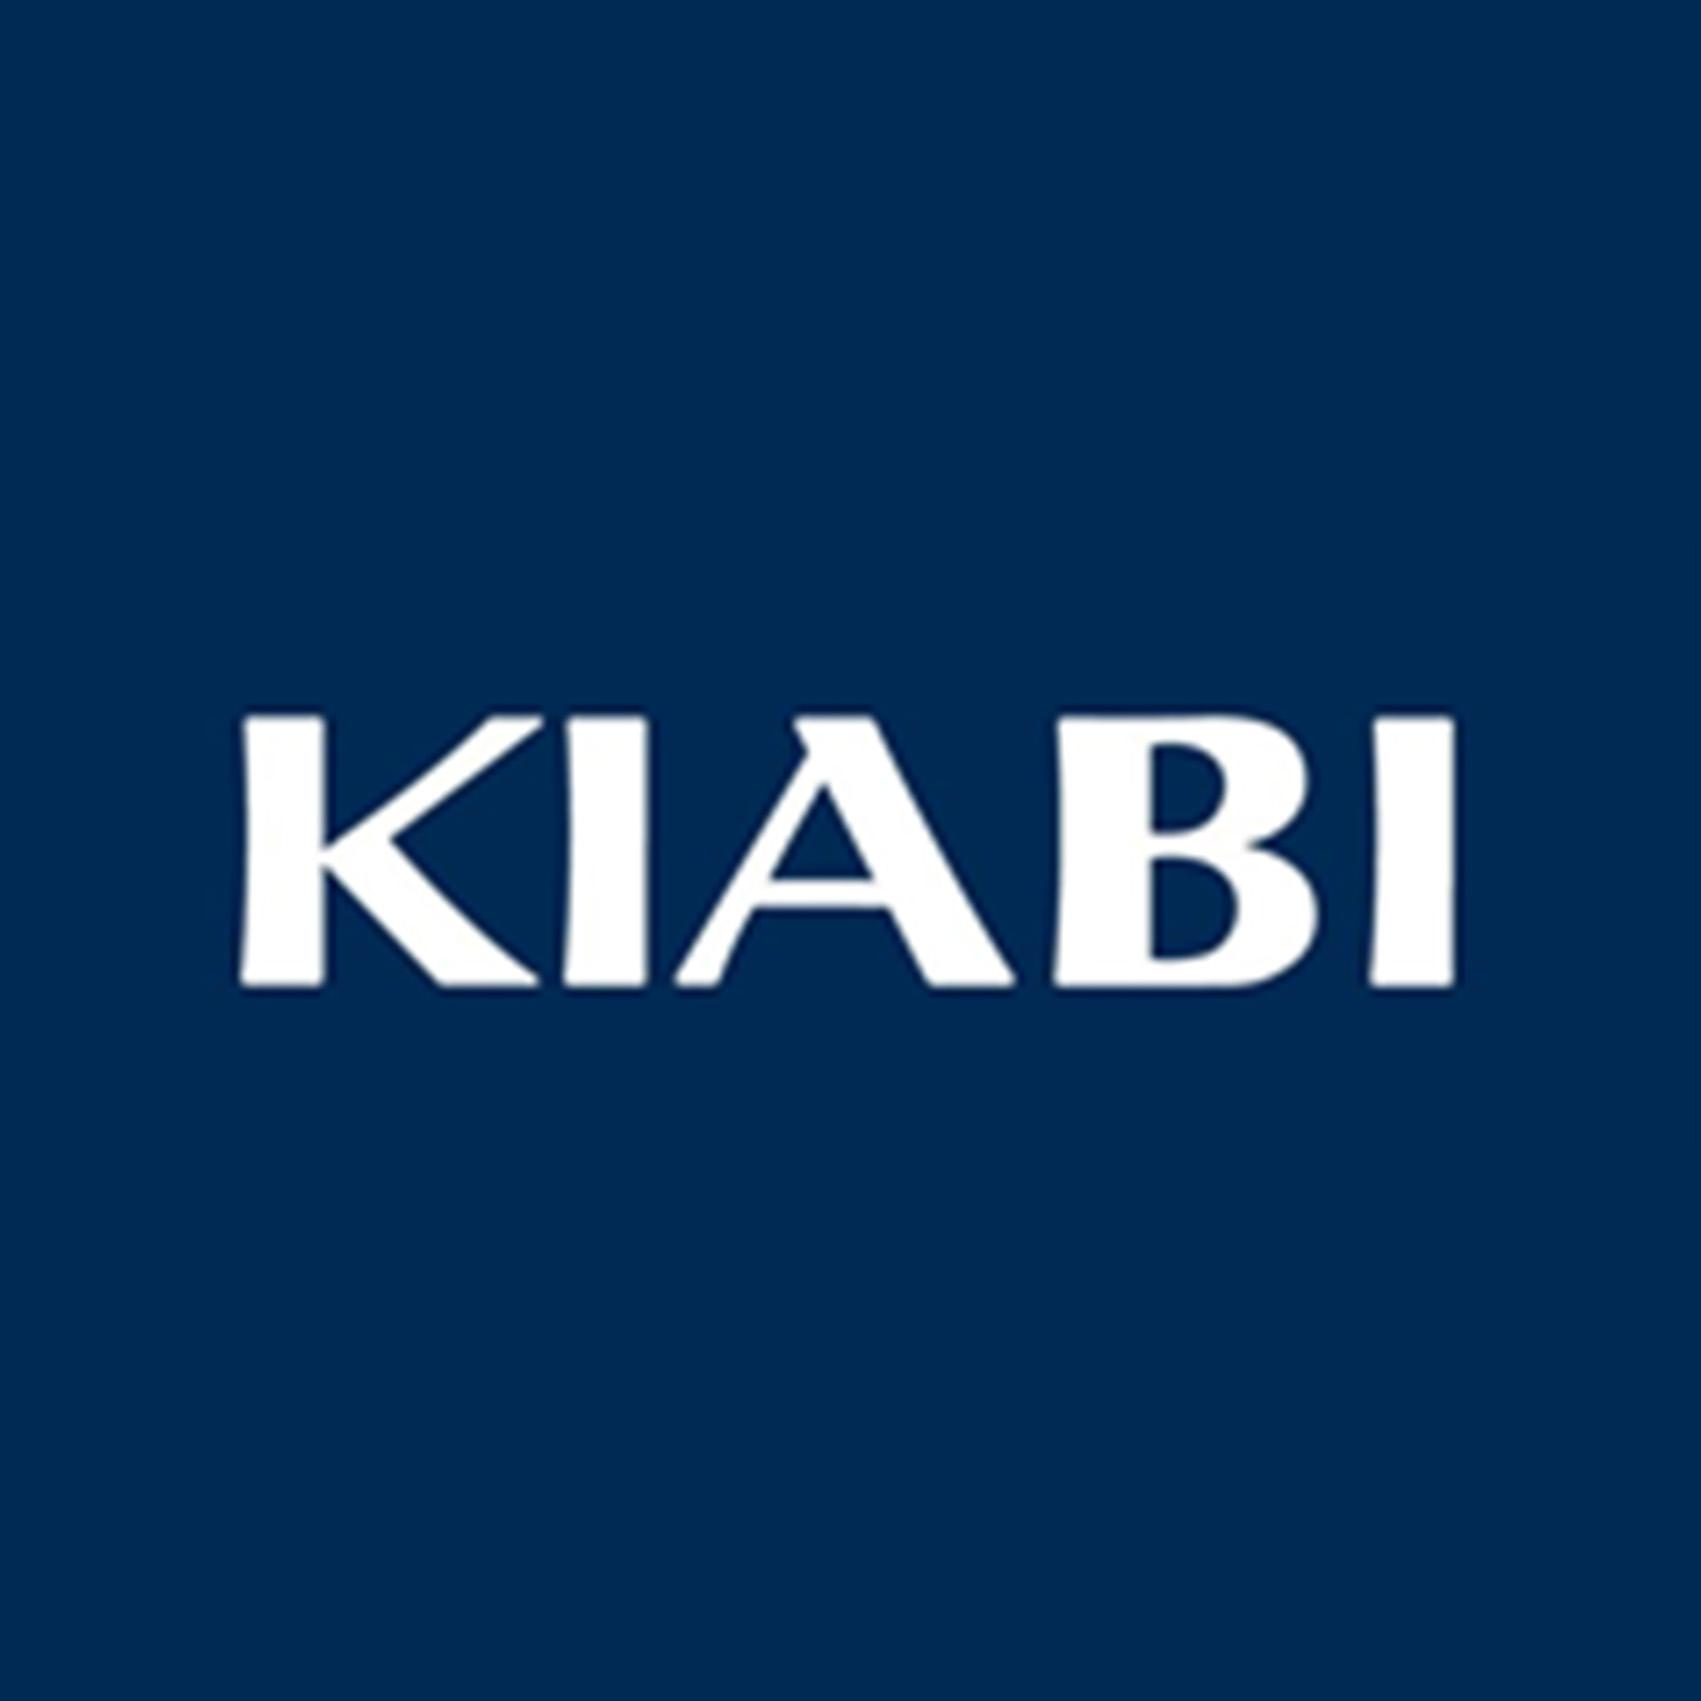 Code promo kiabi, un super bon plan à trouver ici